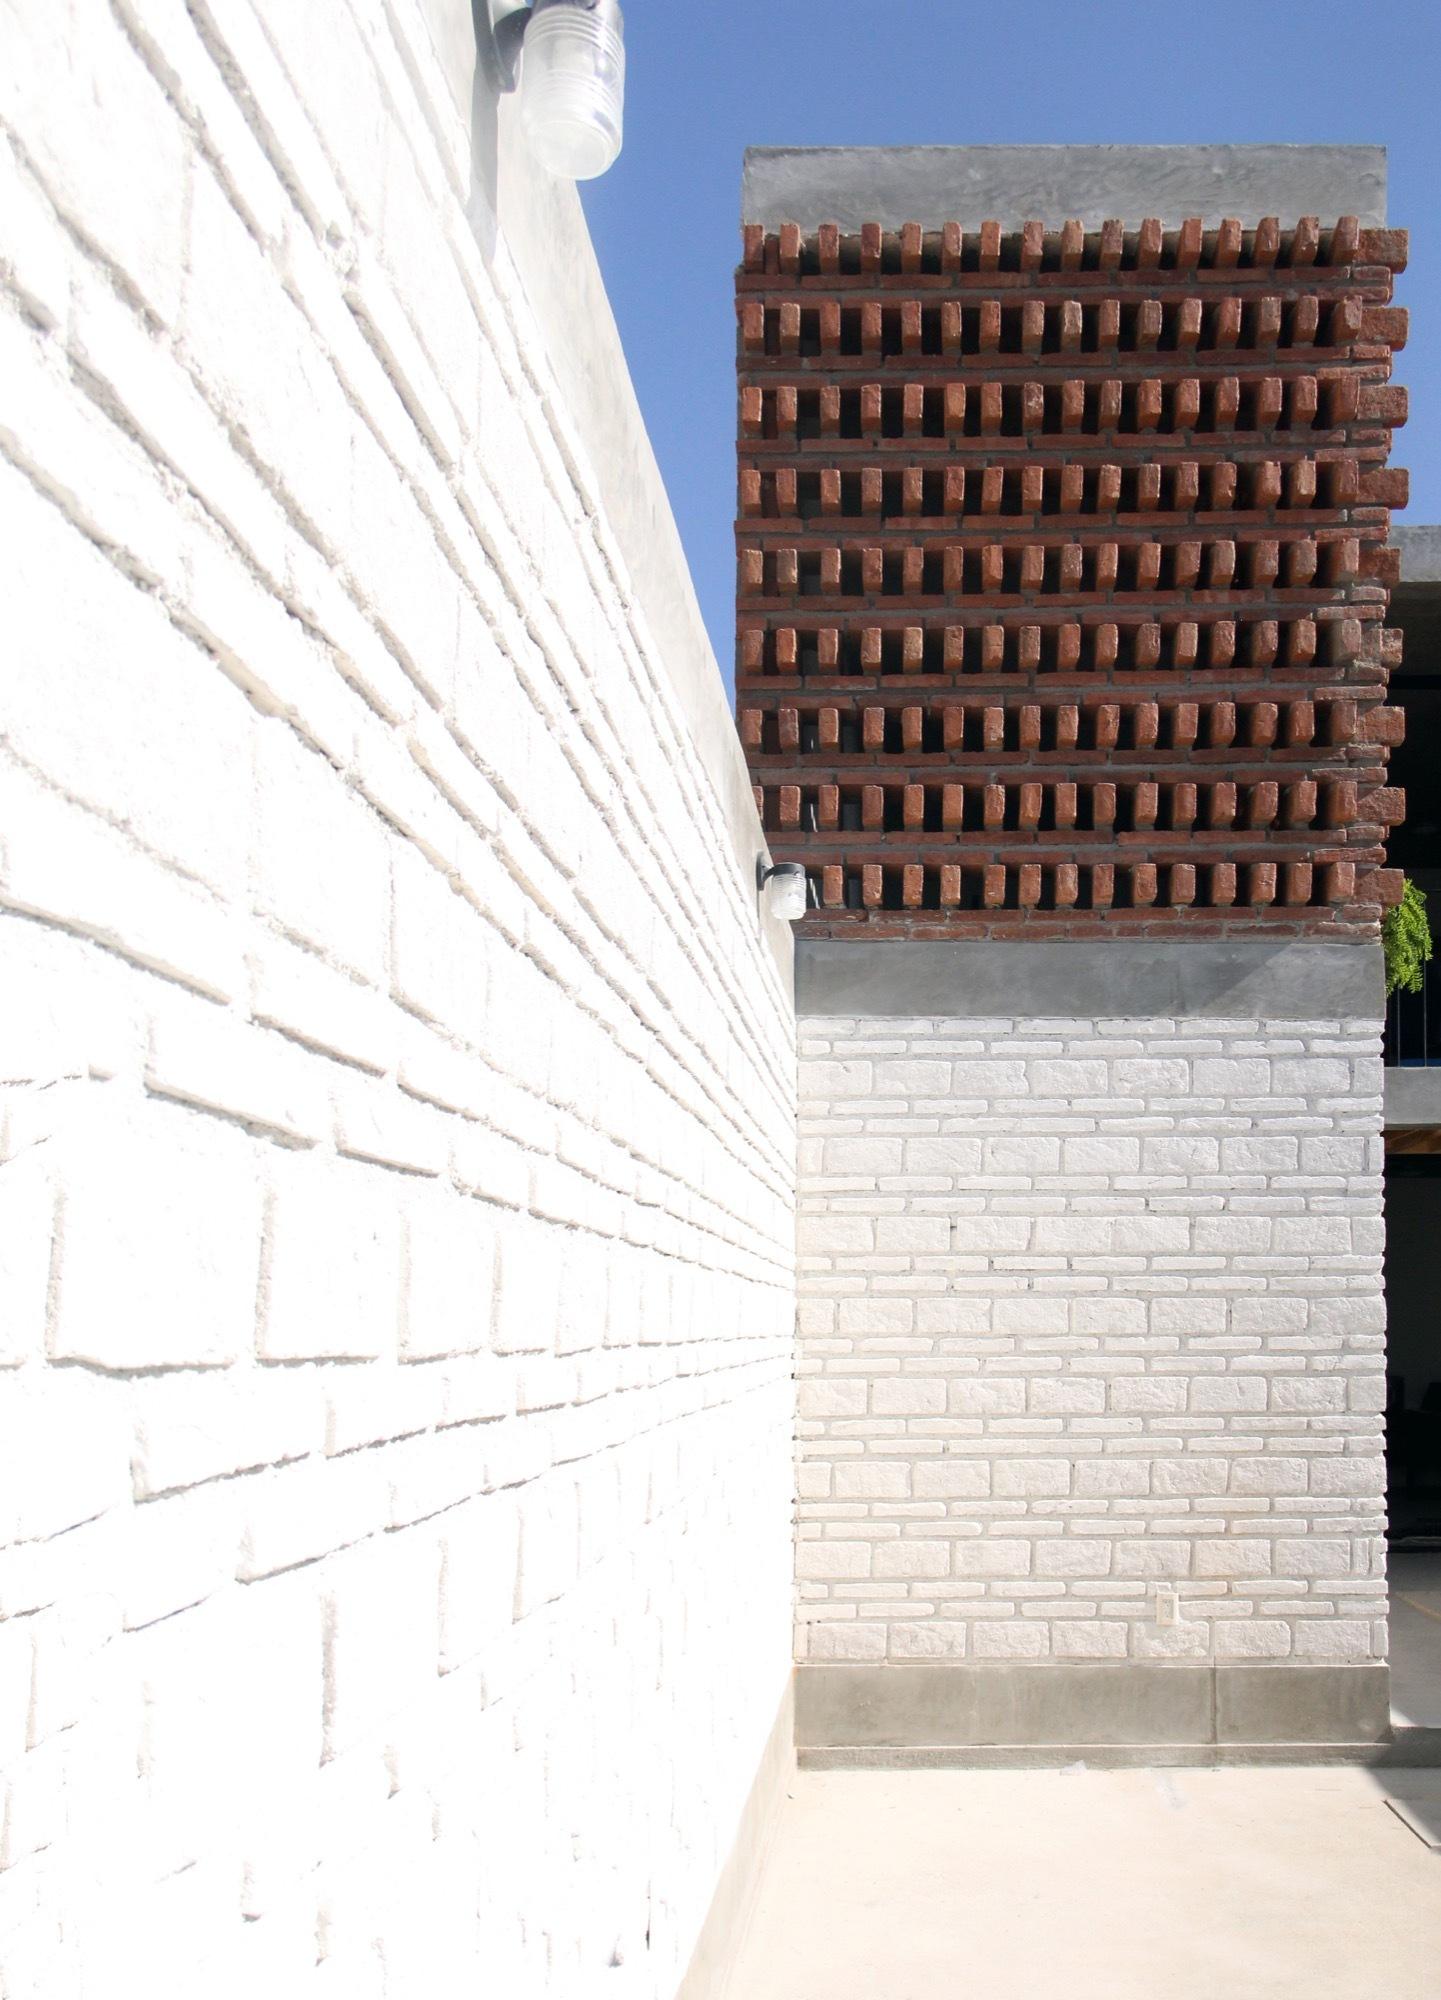 Galer a de casa g la apaloosa estudio de arquitectura y for Arq estudio de arquitectura